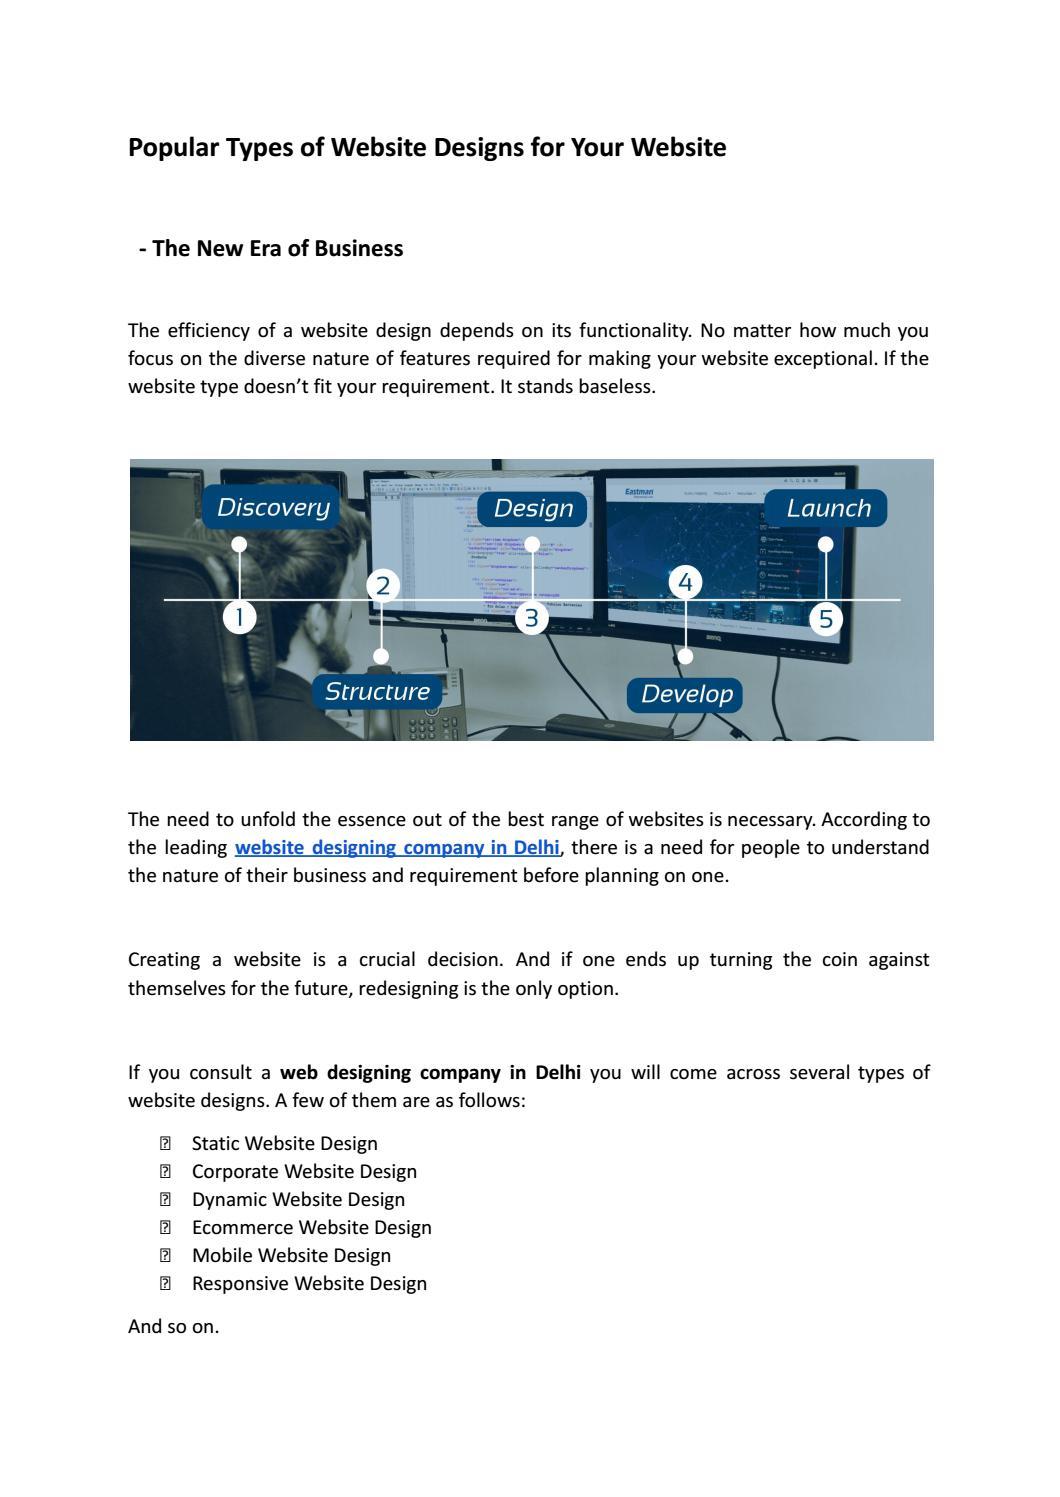 Popular Types of Website Designs for Your Website